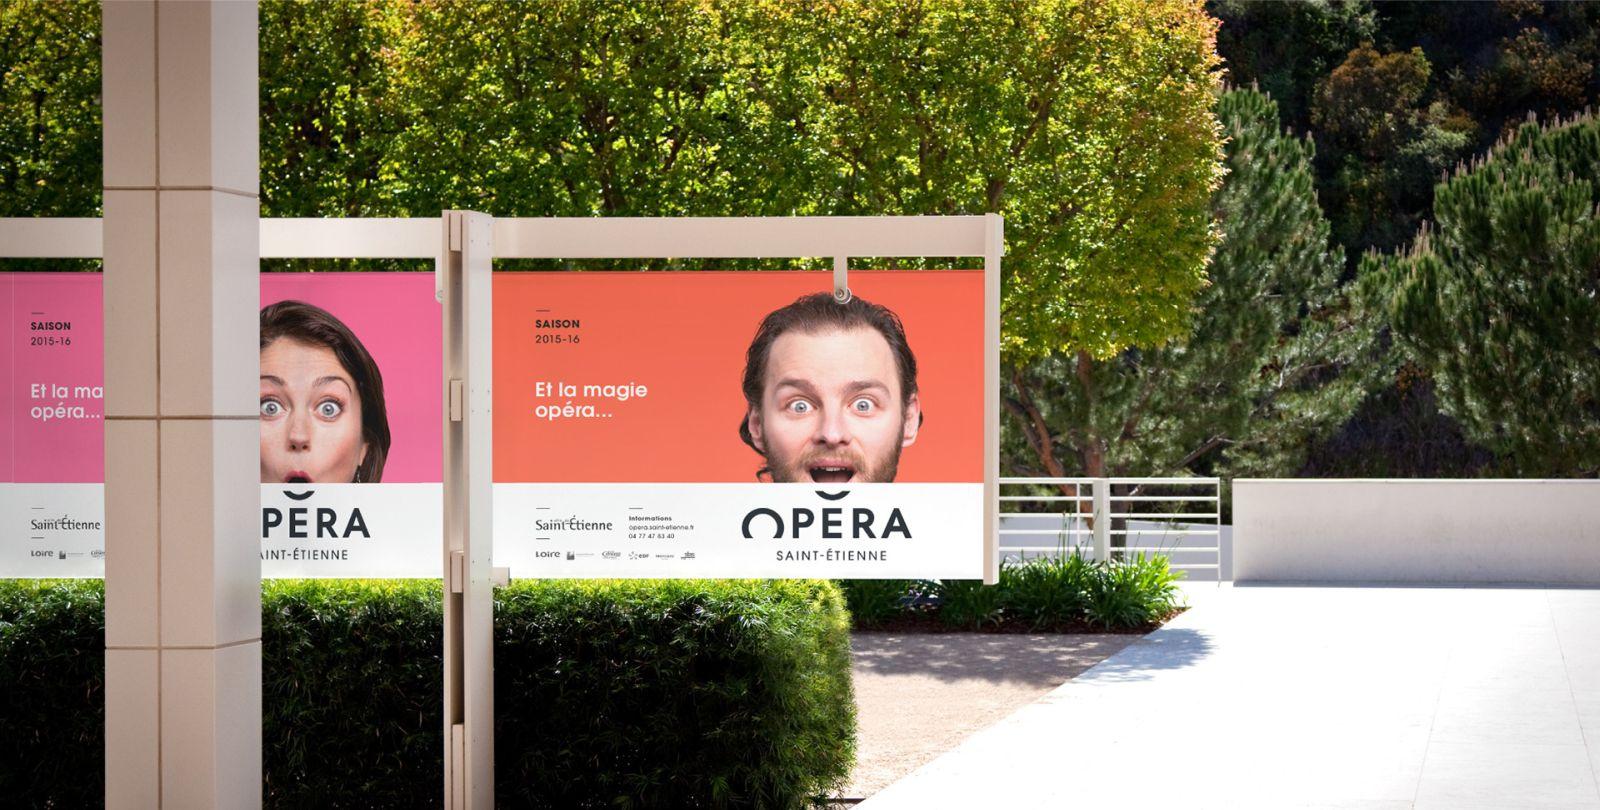 innovative brand design identity of saint etienne opera by grapheine